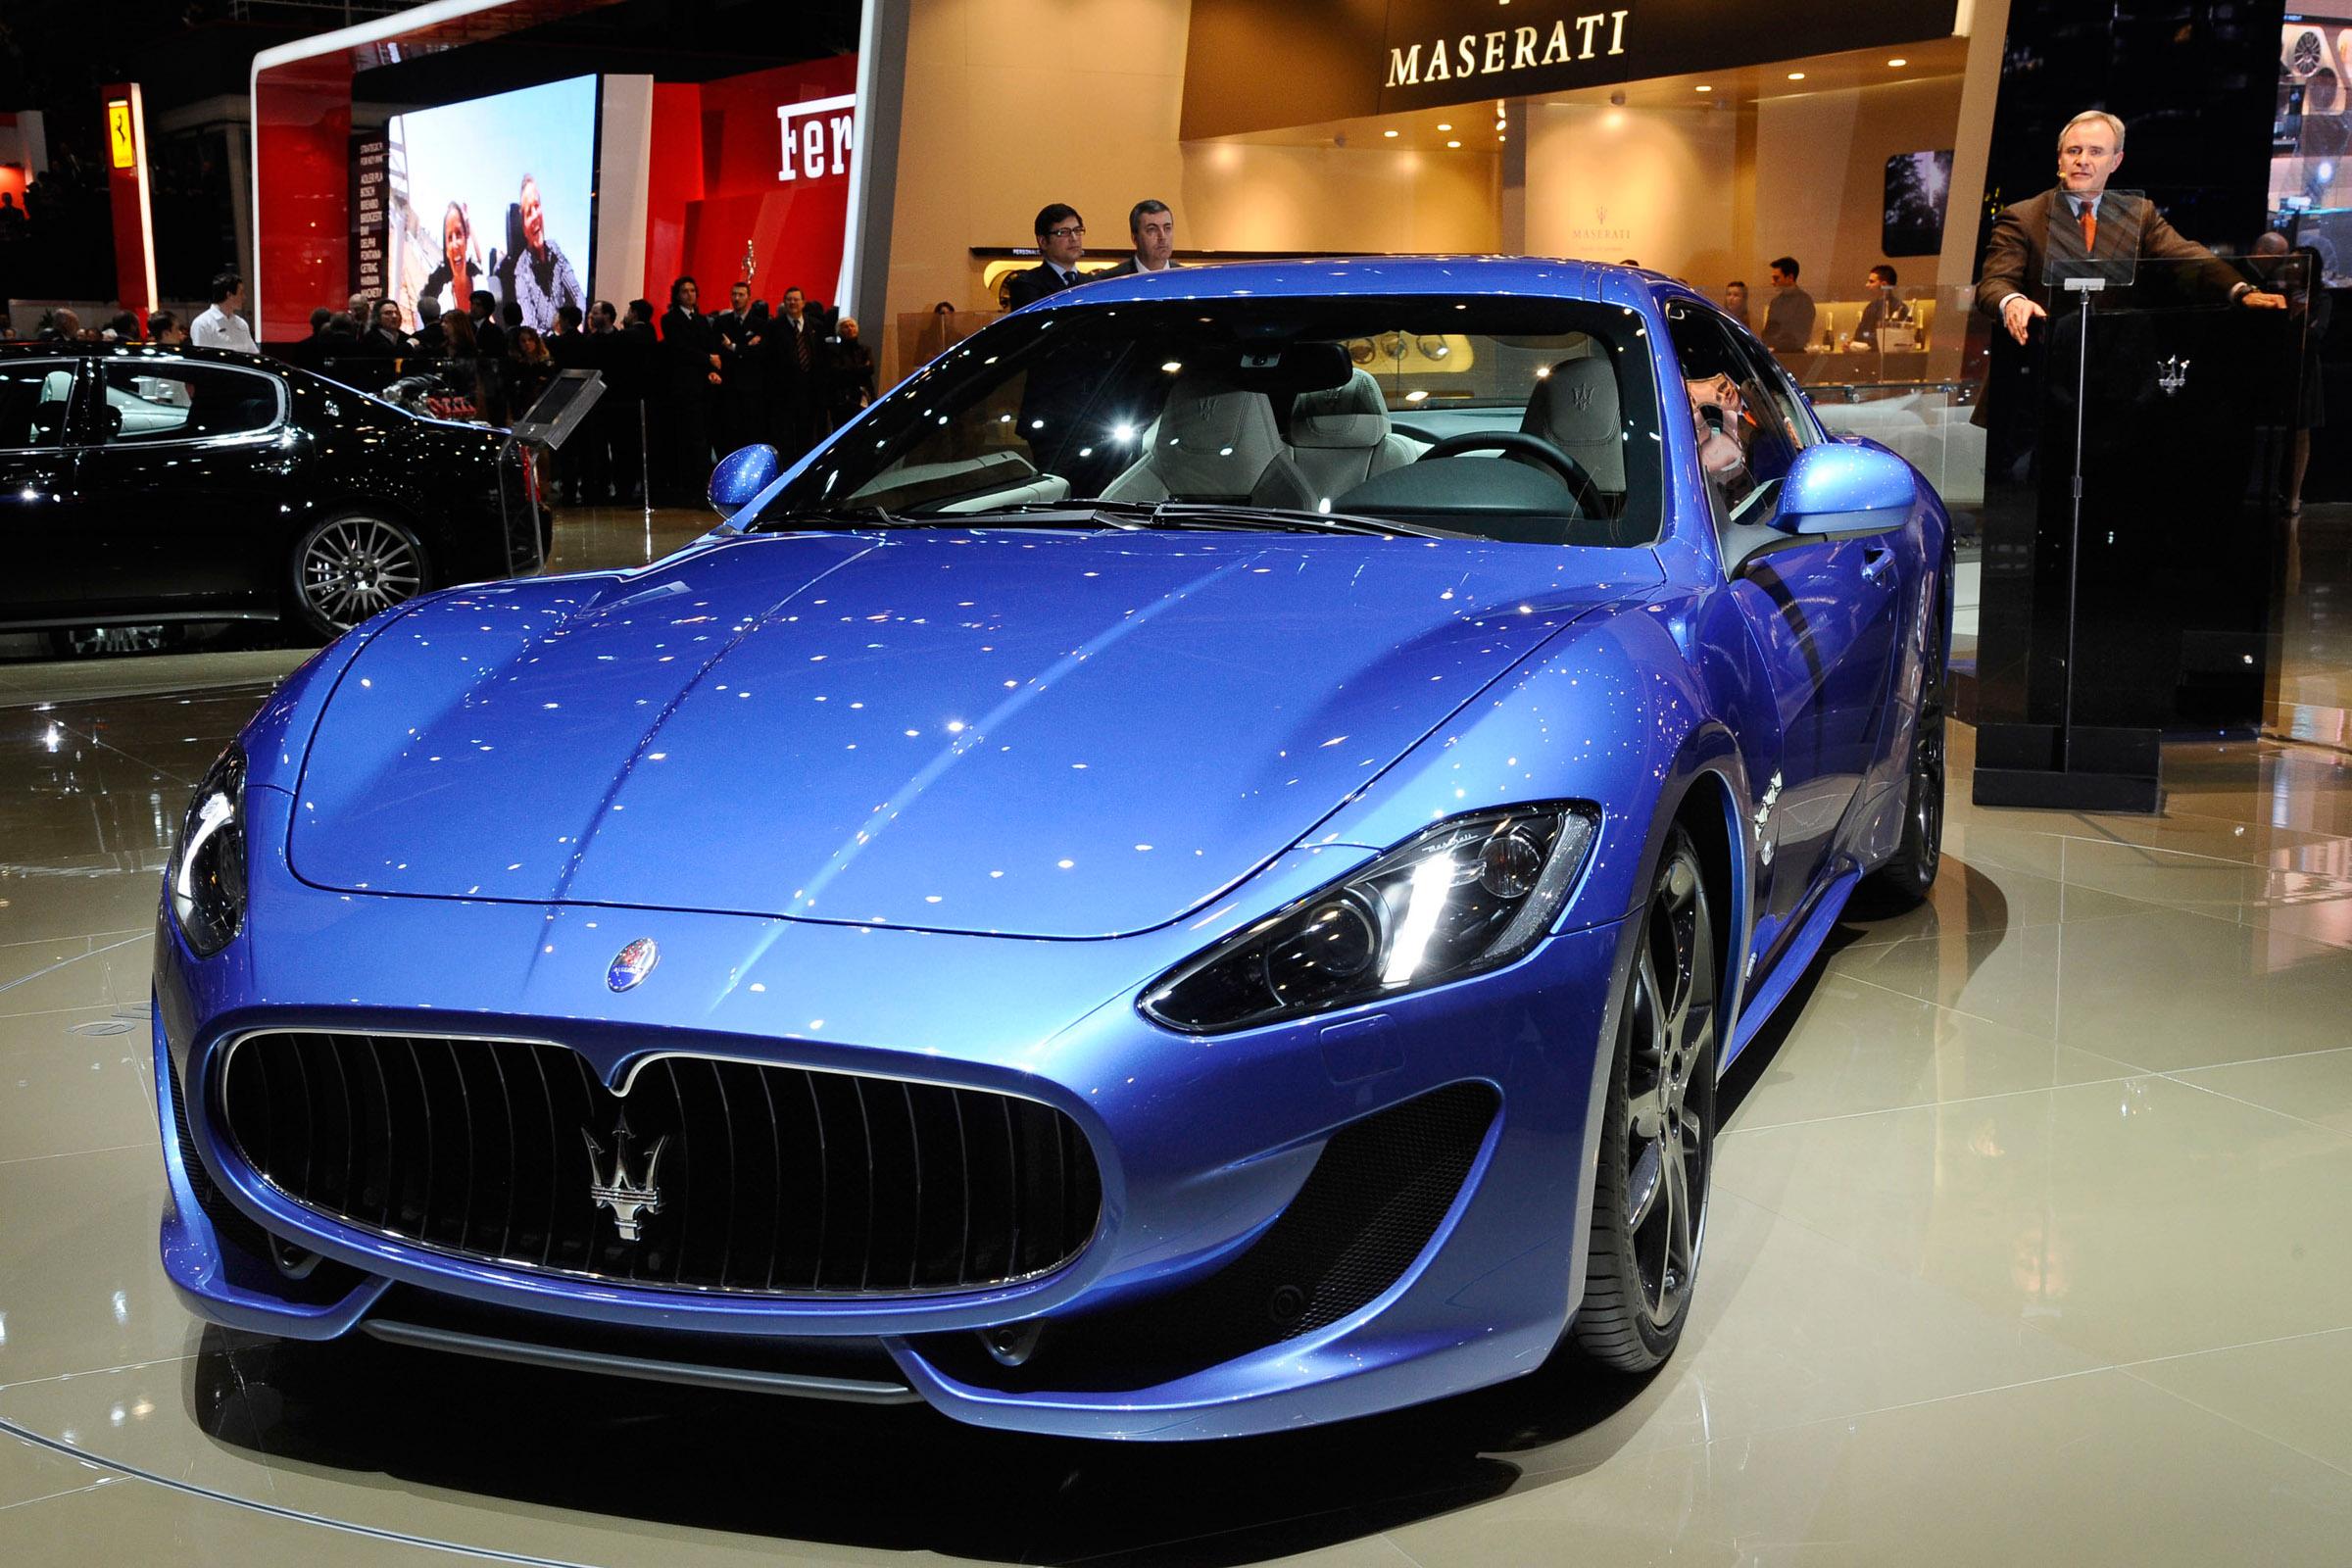 https://www.automobilesreview.com/gallery/maserati-granturismo-sport-geneva-2012/maserati-granturismo-sport-geneva-2012-04.jpg